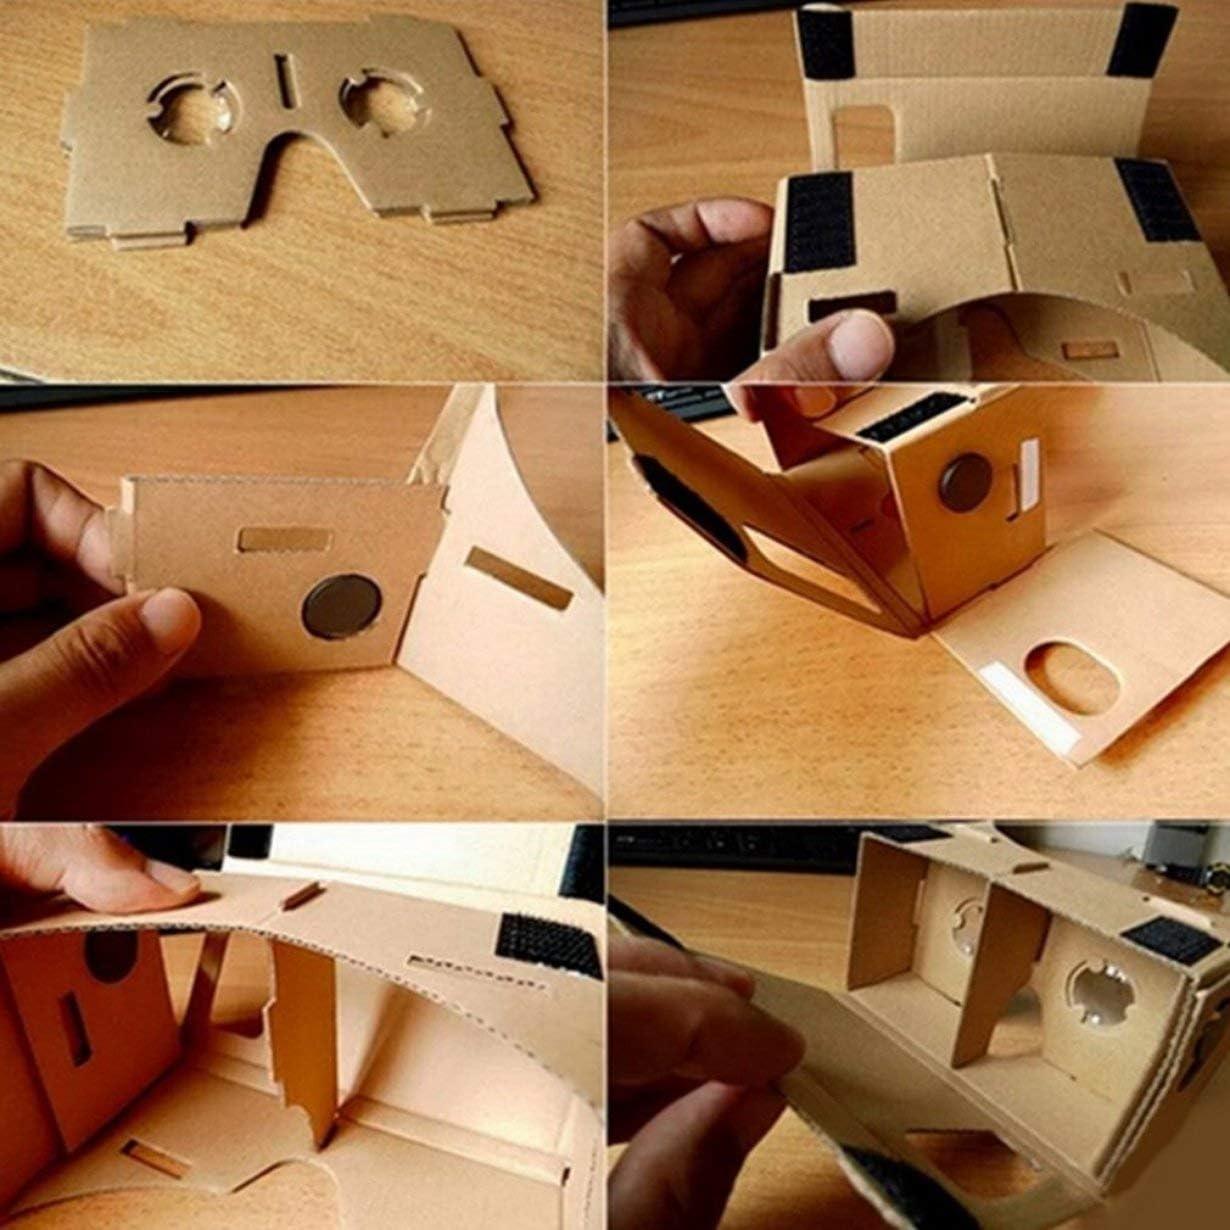 Ulter Klar DIY Karton 3D-VR Virtual Reality-Brille f/ür Smartphone Qualit/äts-DIY Magnet Google Pappen Glasses khaki